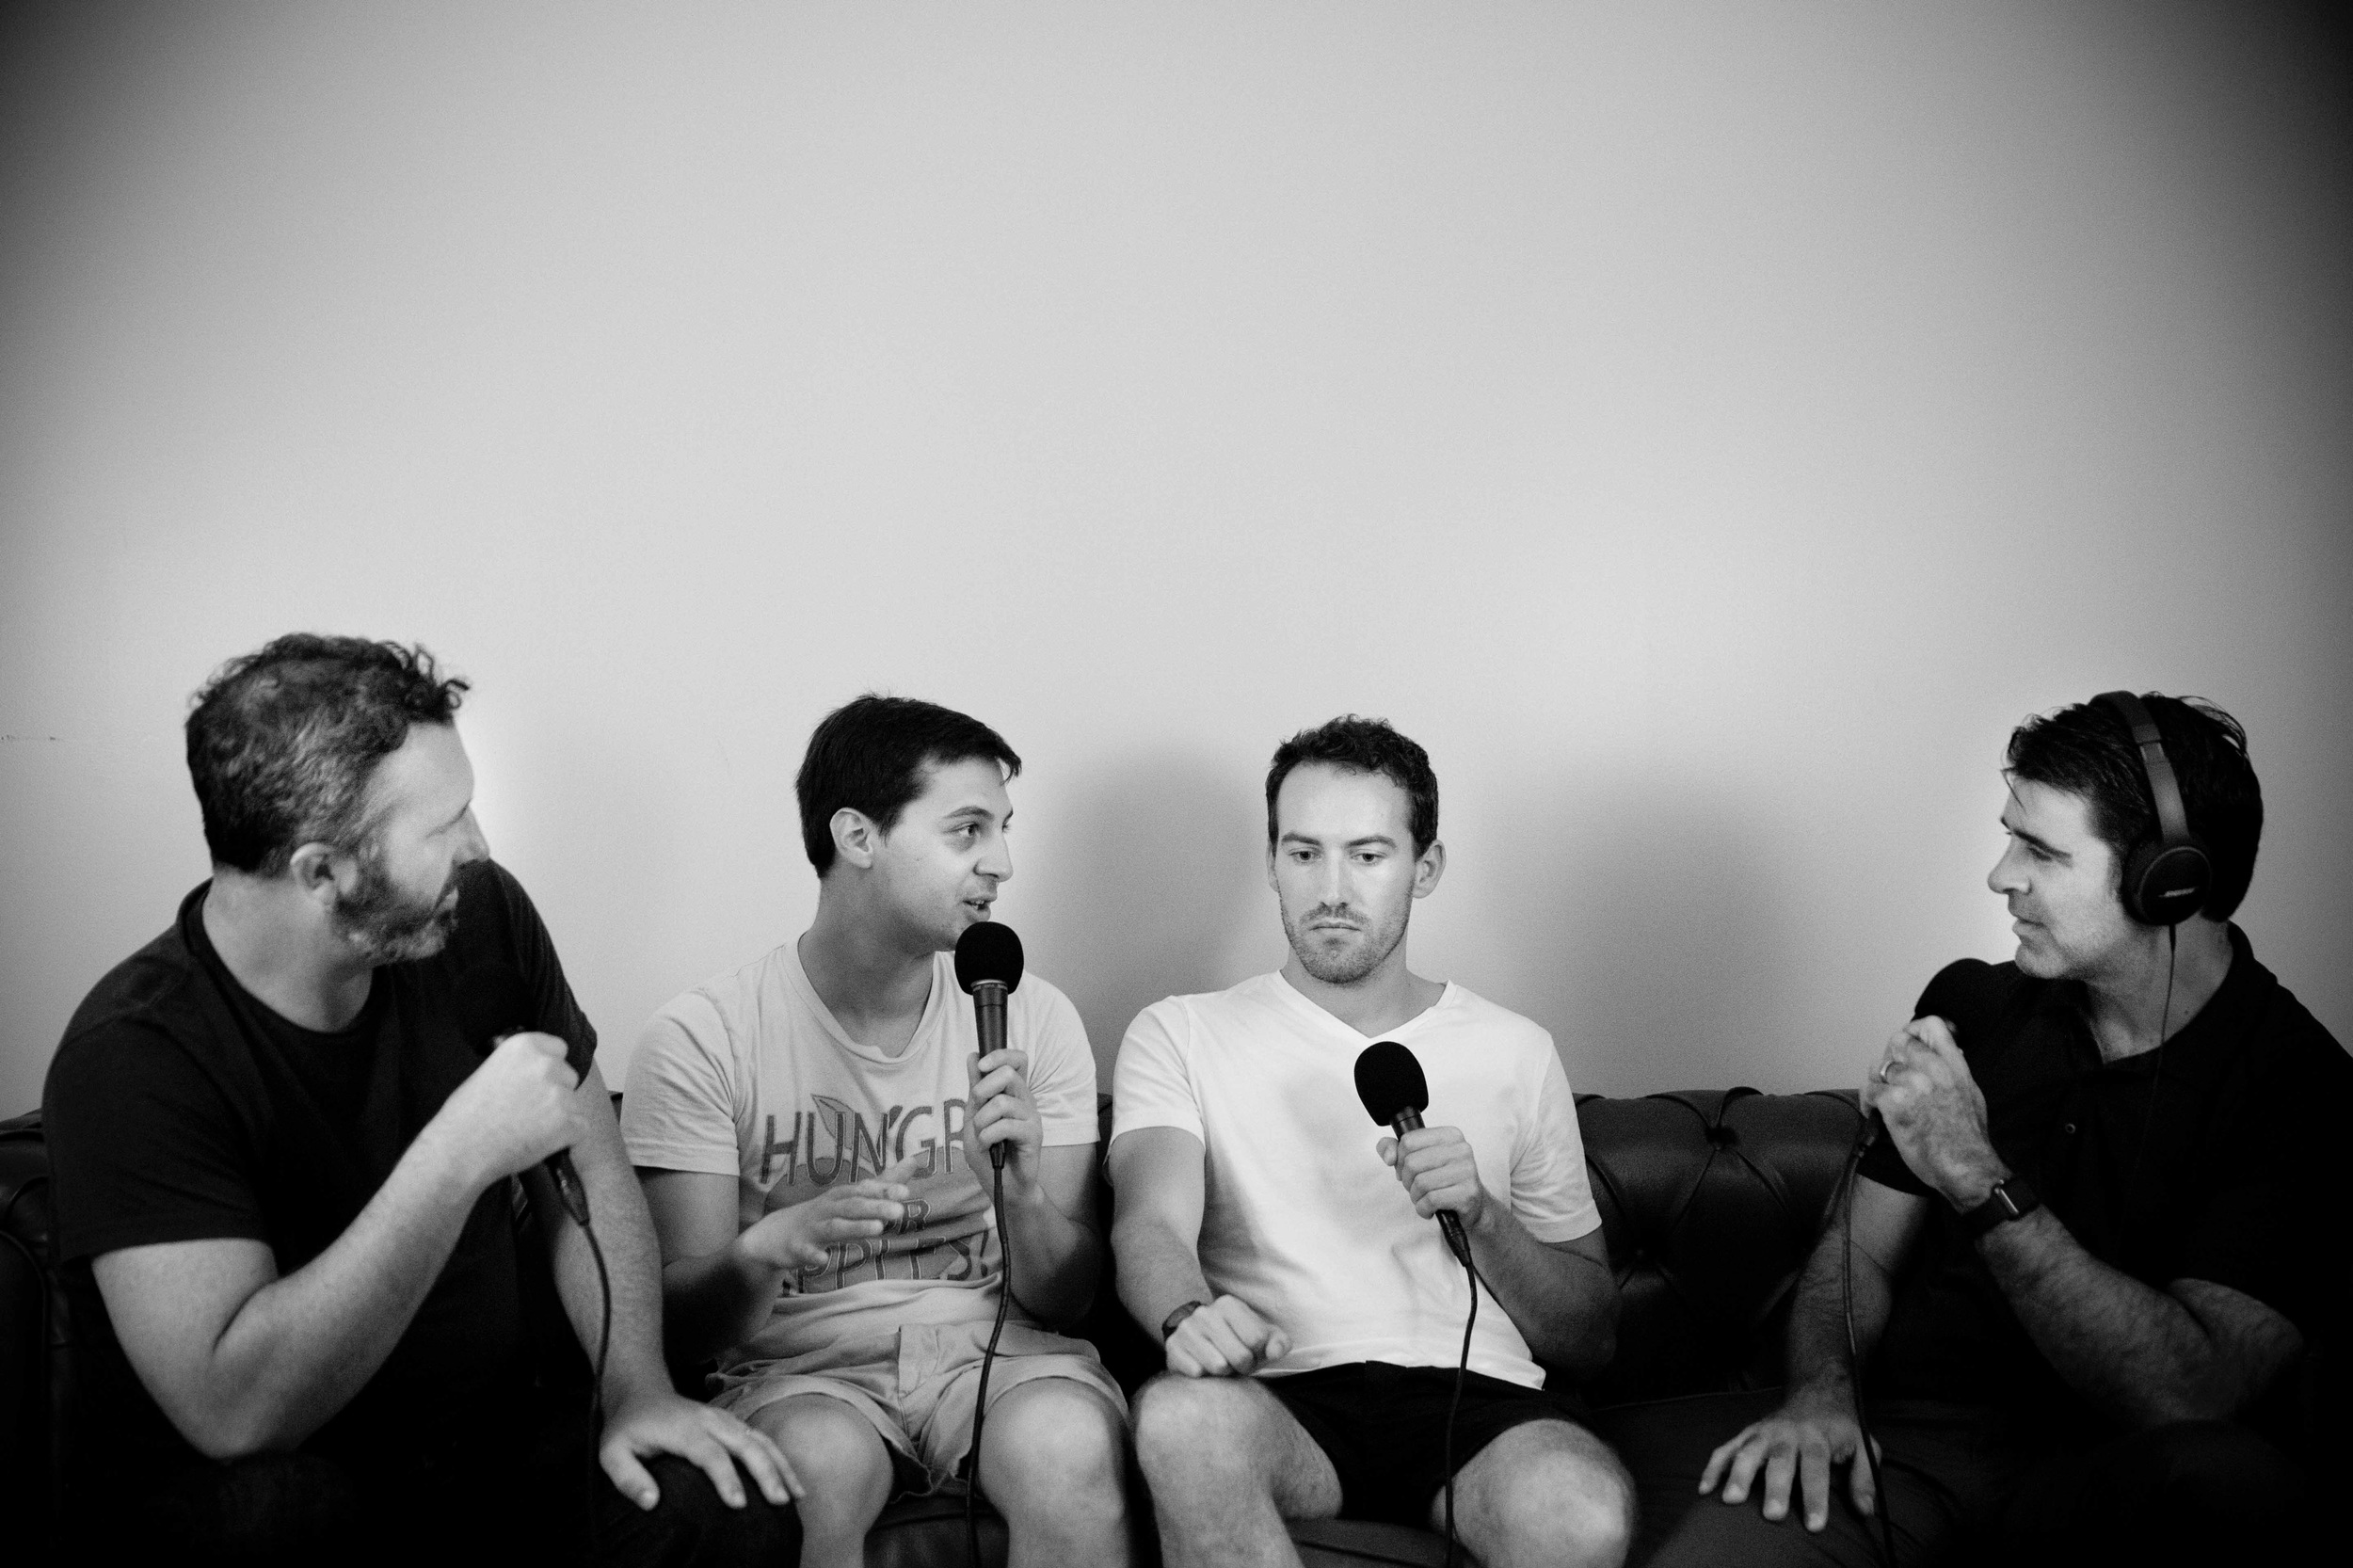 Left to right: Ben, Matt, Alex, and Bob.Photo by  Crackerfarm